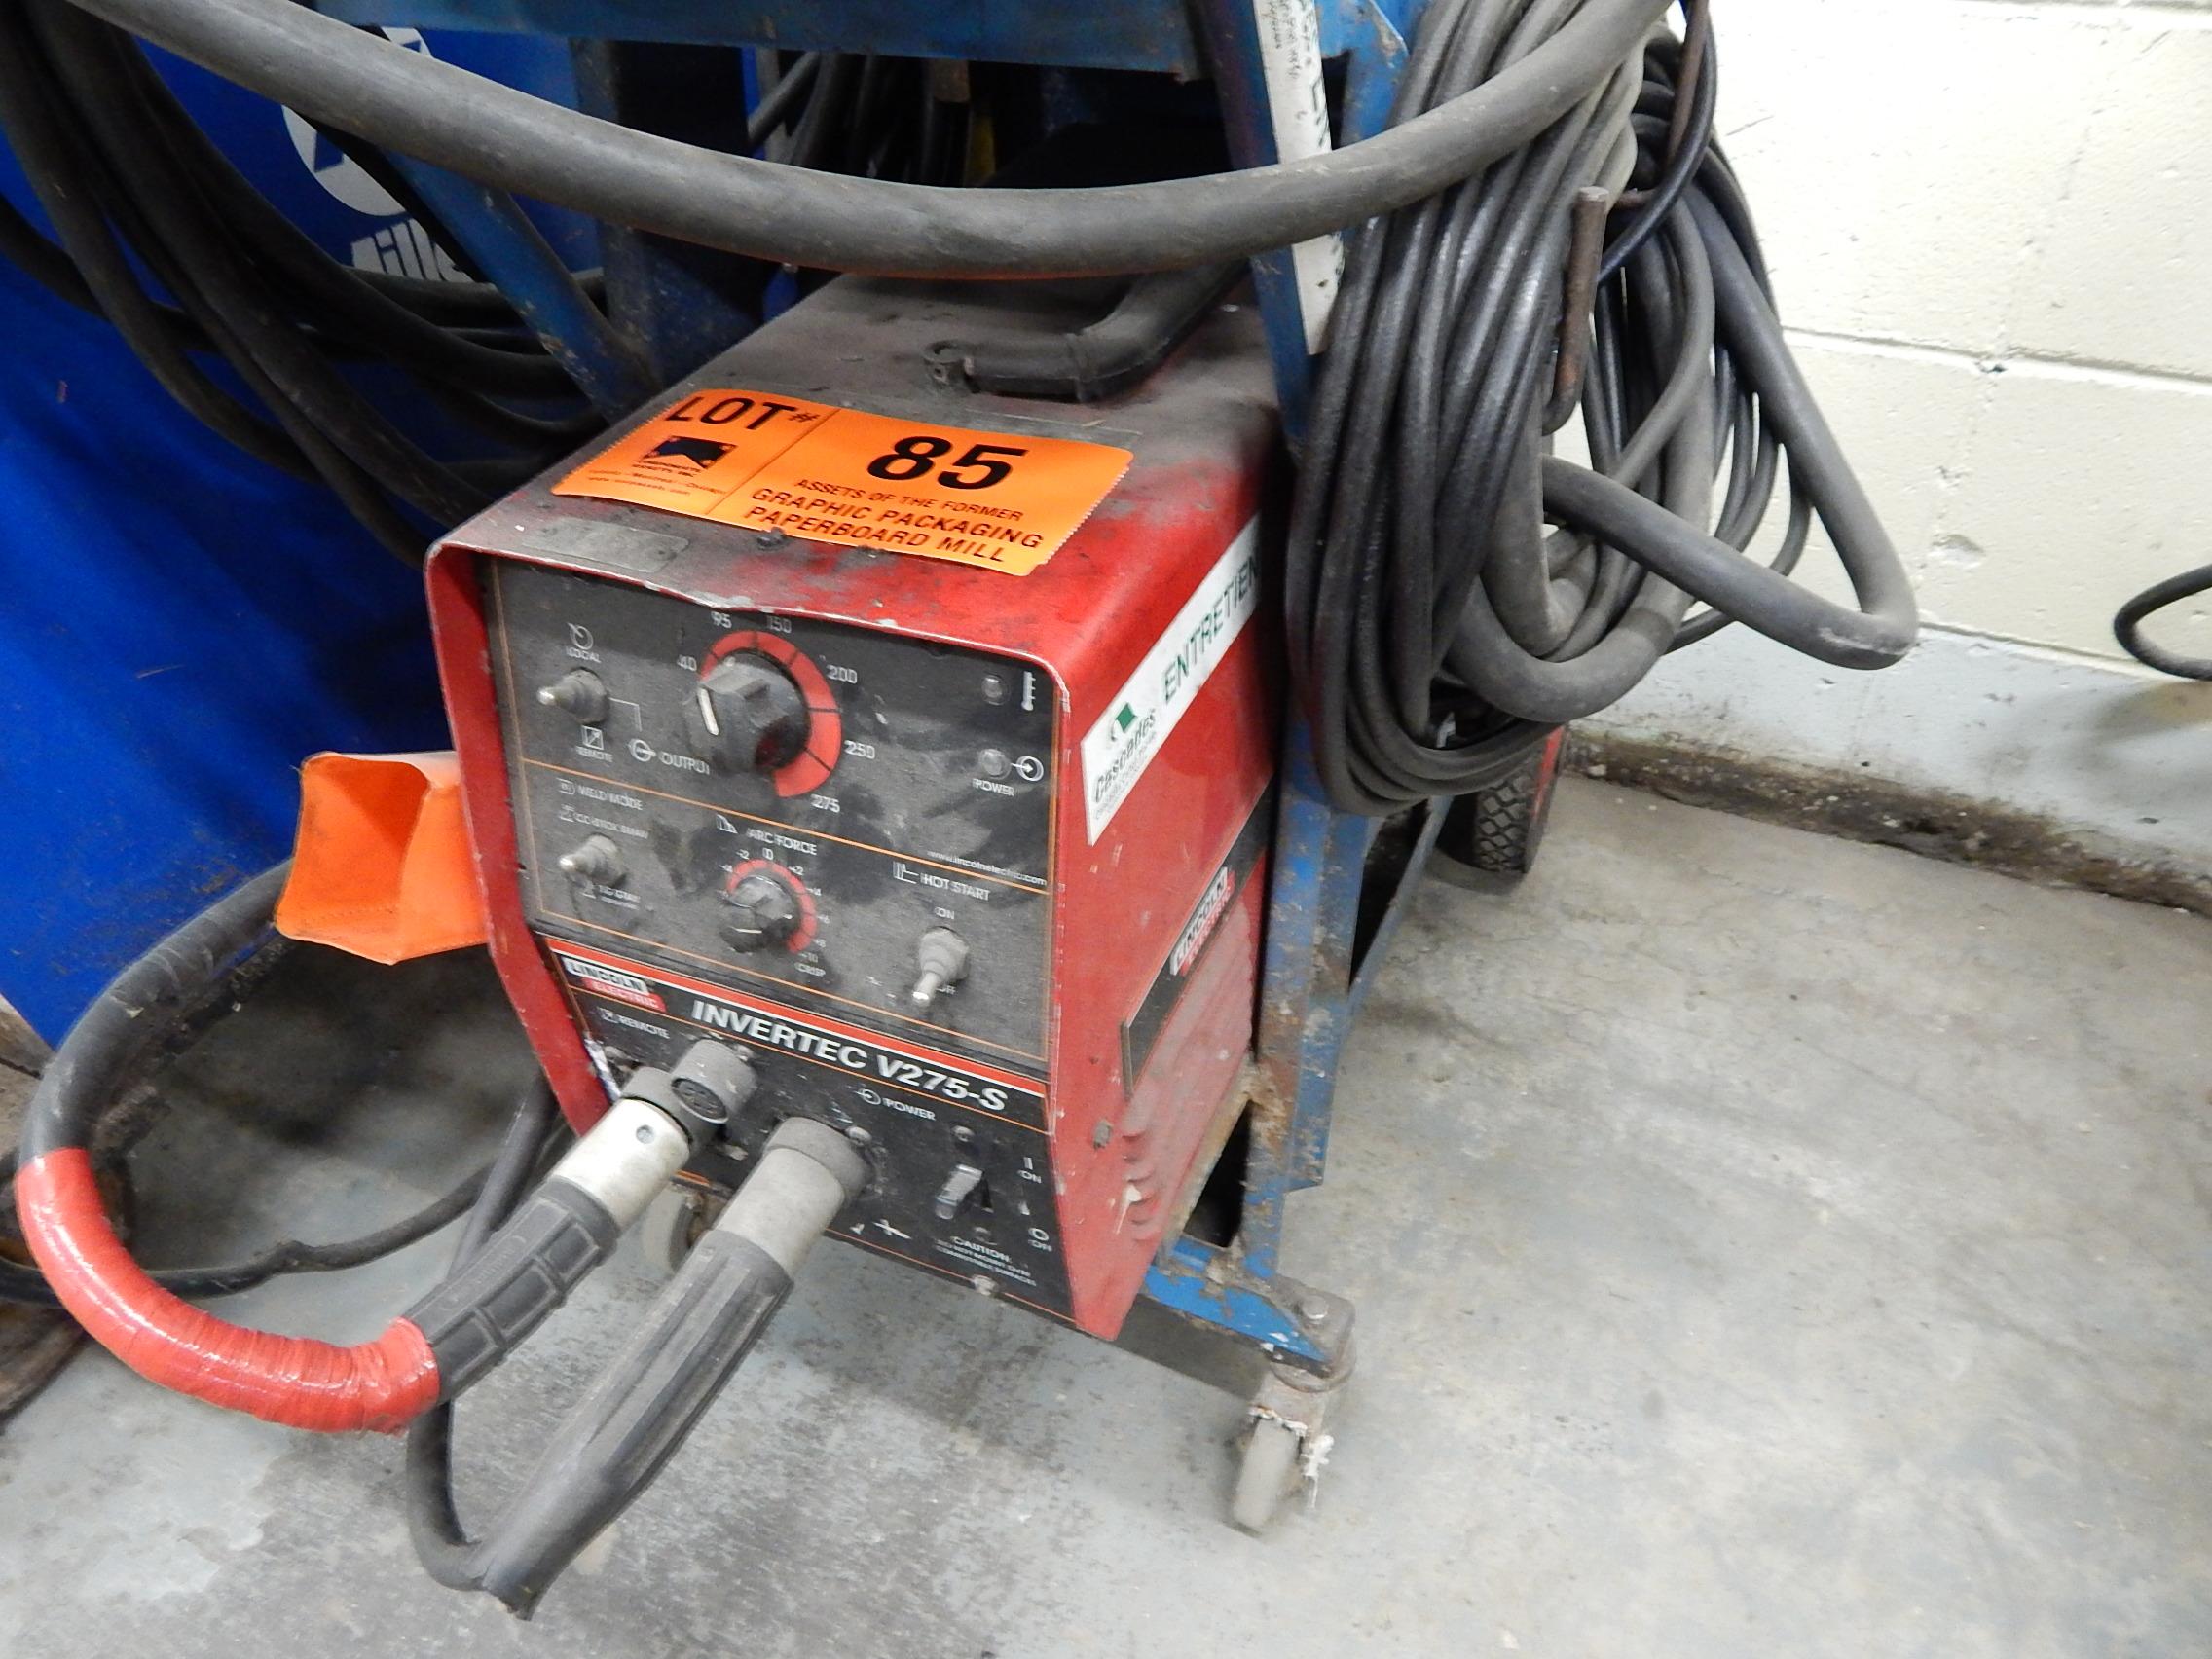 Lincoln Electric Invertec V 275 S Portable Mig Welder Maintenance Parts Lot 85